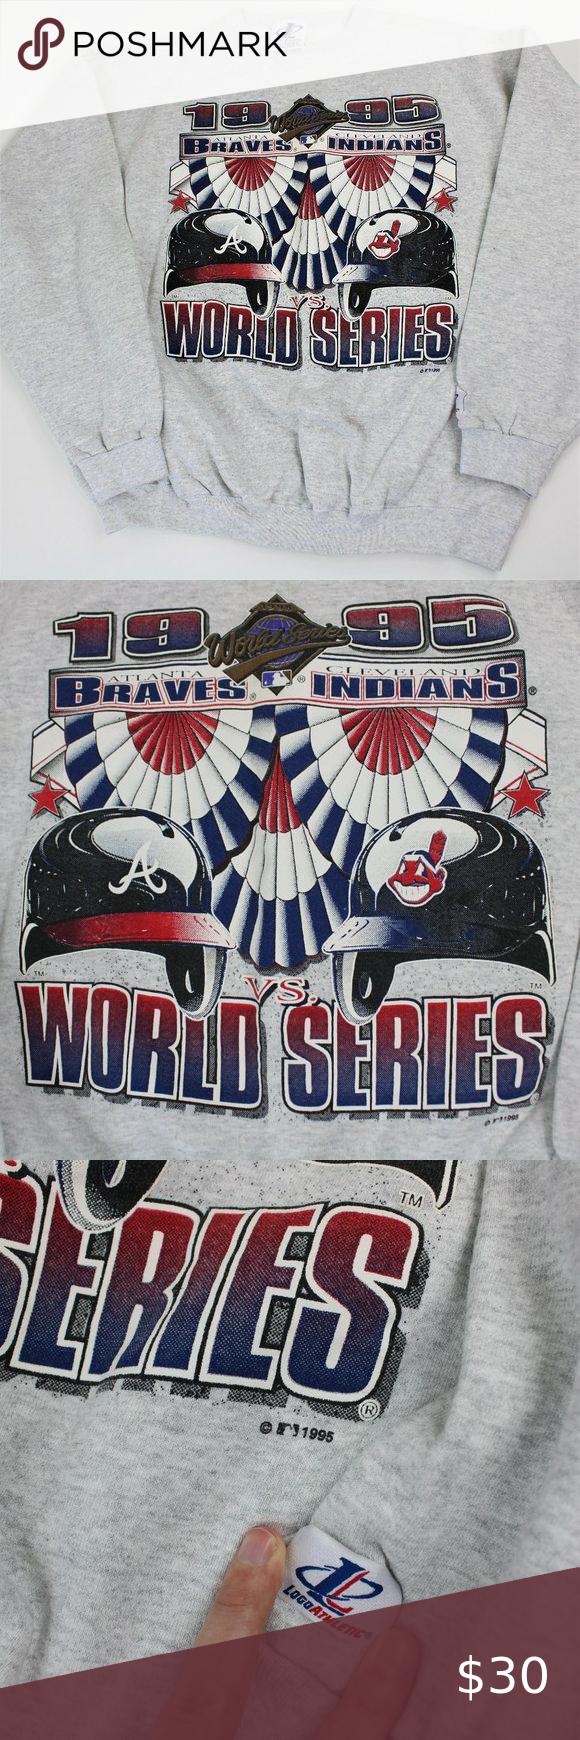 1995 World Series Vtg Sweatshirt Indians Vs Braves Vintage 1995 Braves Indians World Series Sweatshirt Sz Xl Gray Logo In 2020 Sweaters Crewneck Sweatshirts Braves